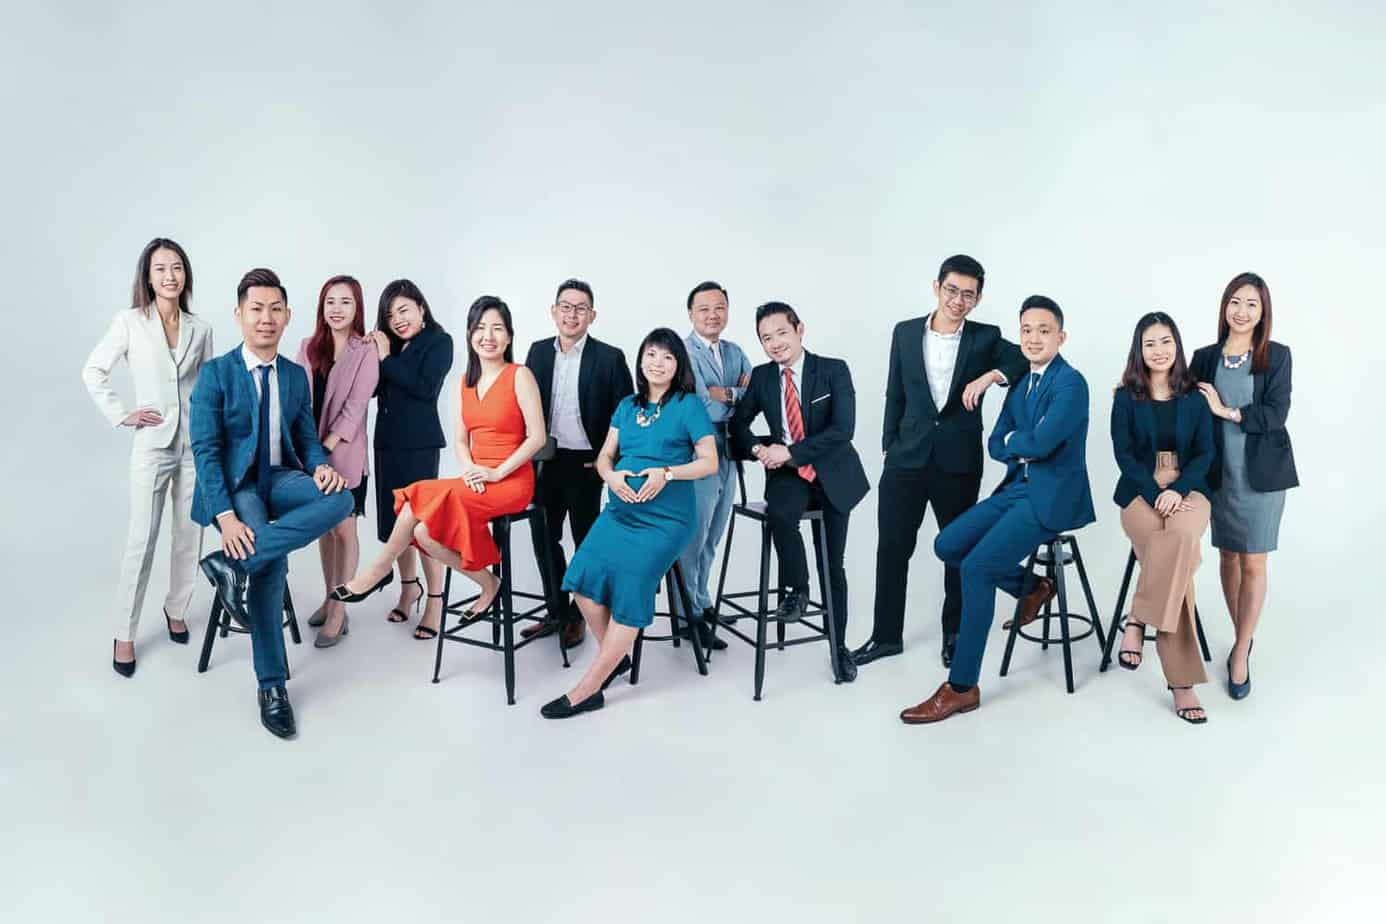 Corporate Group Photoshoot Singapore